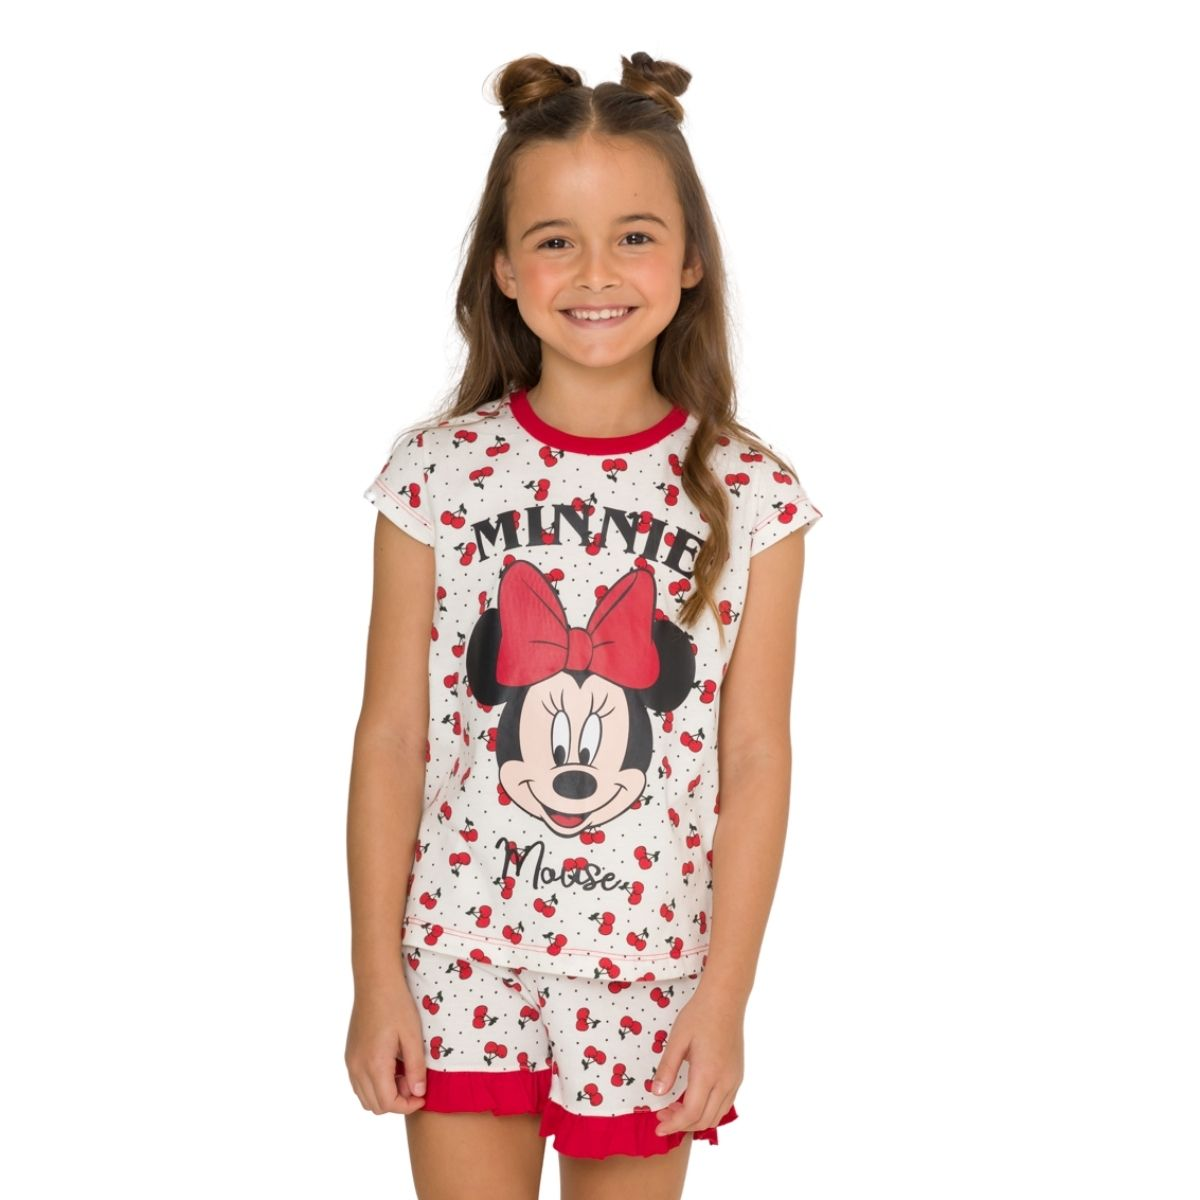 Pijama infanitl menina minnie manguinha short babadinho